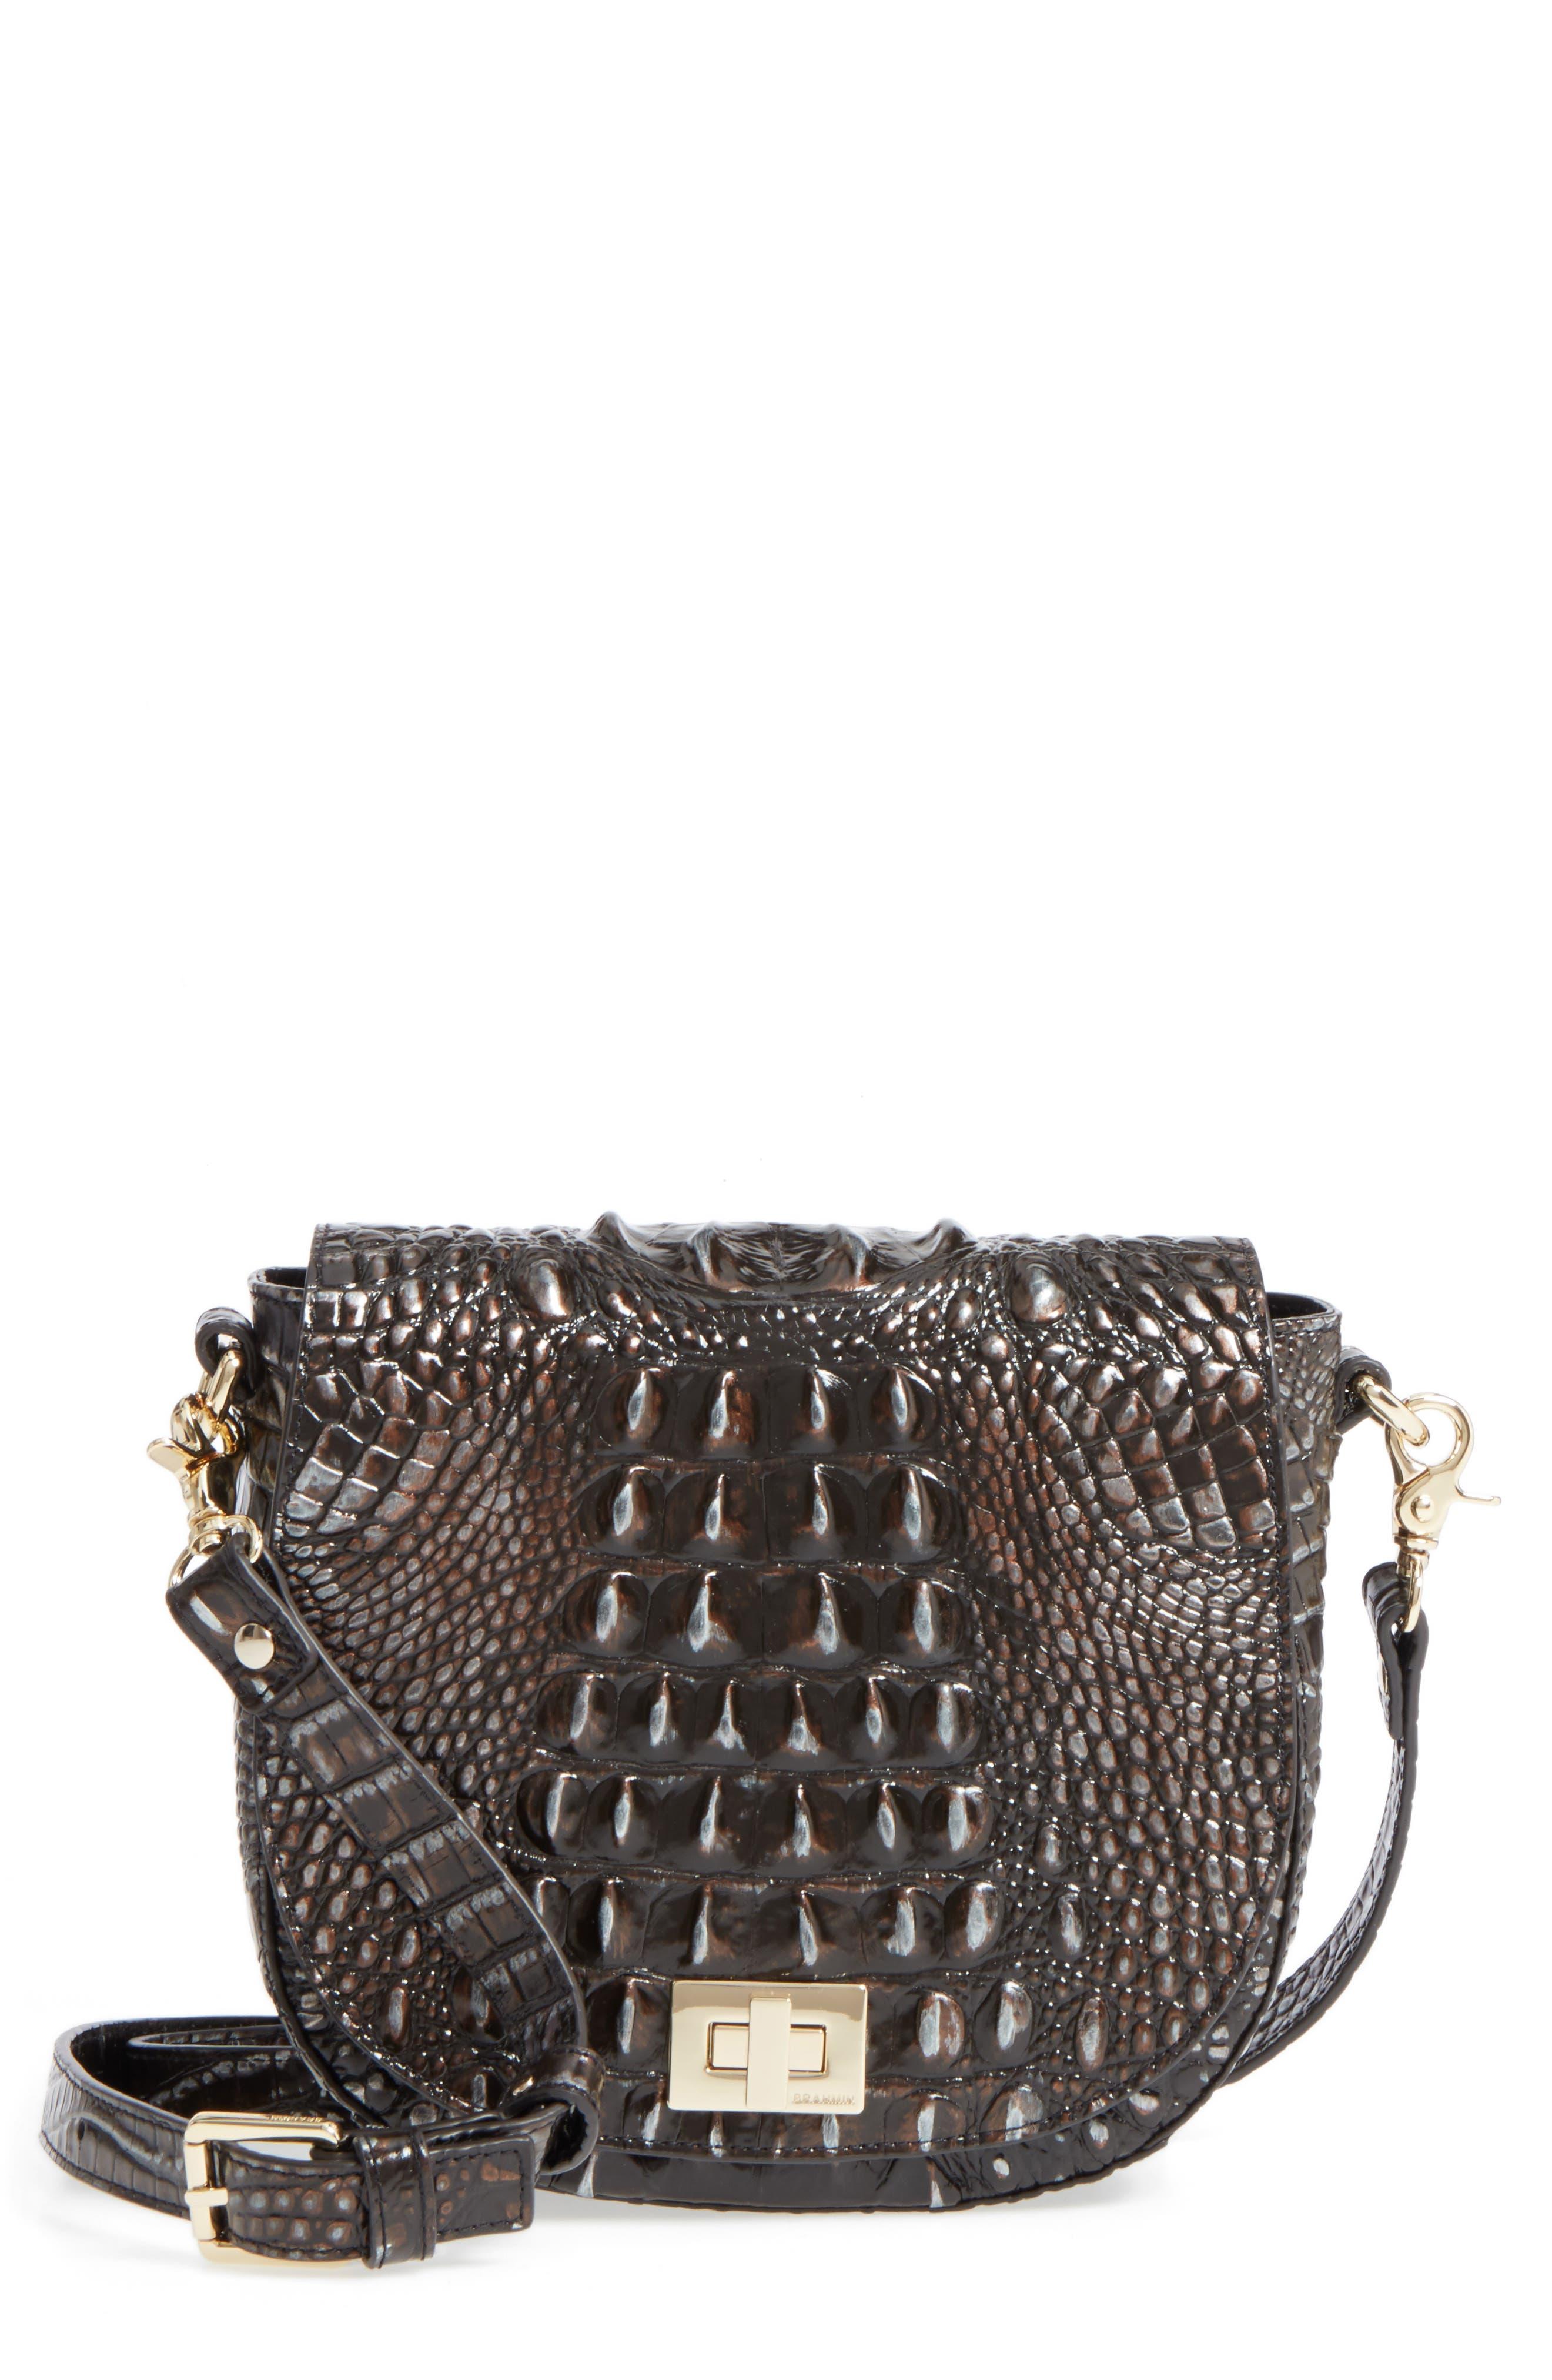 Main Image - Brahmin Mini Sonny Leather Crossbody Bag